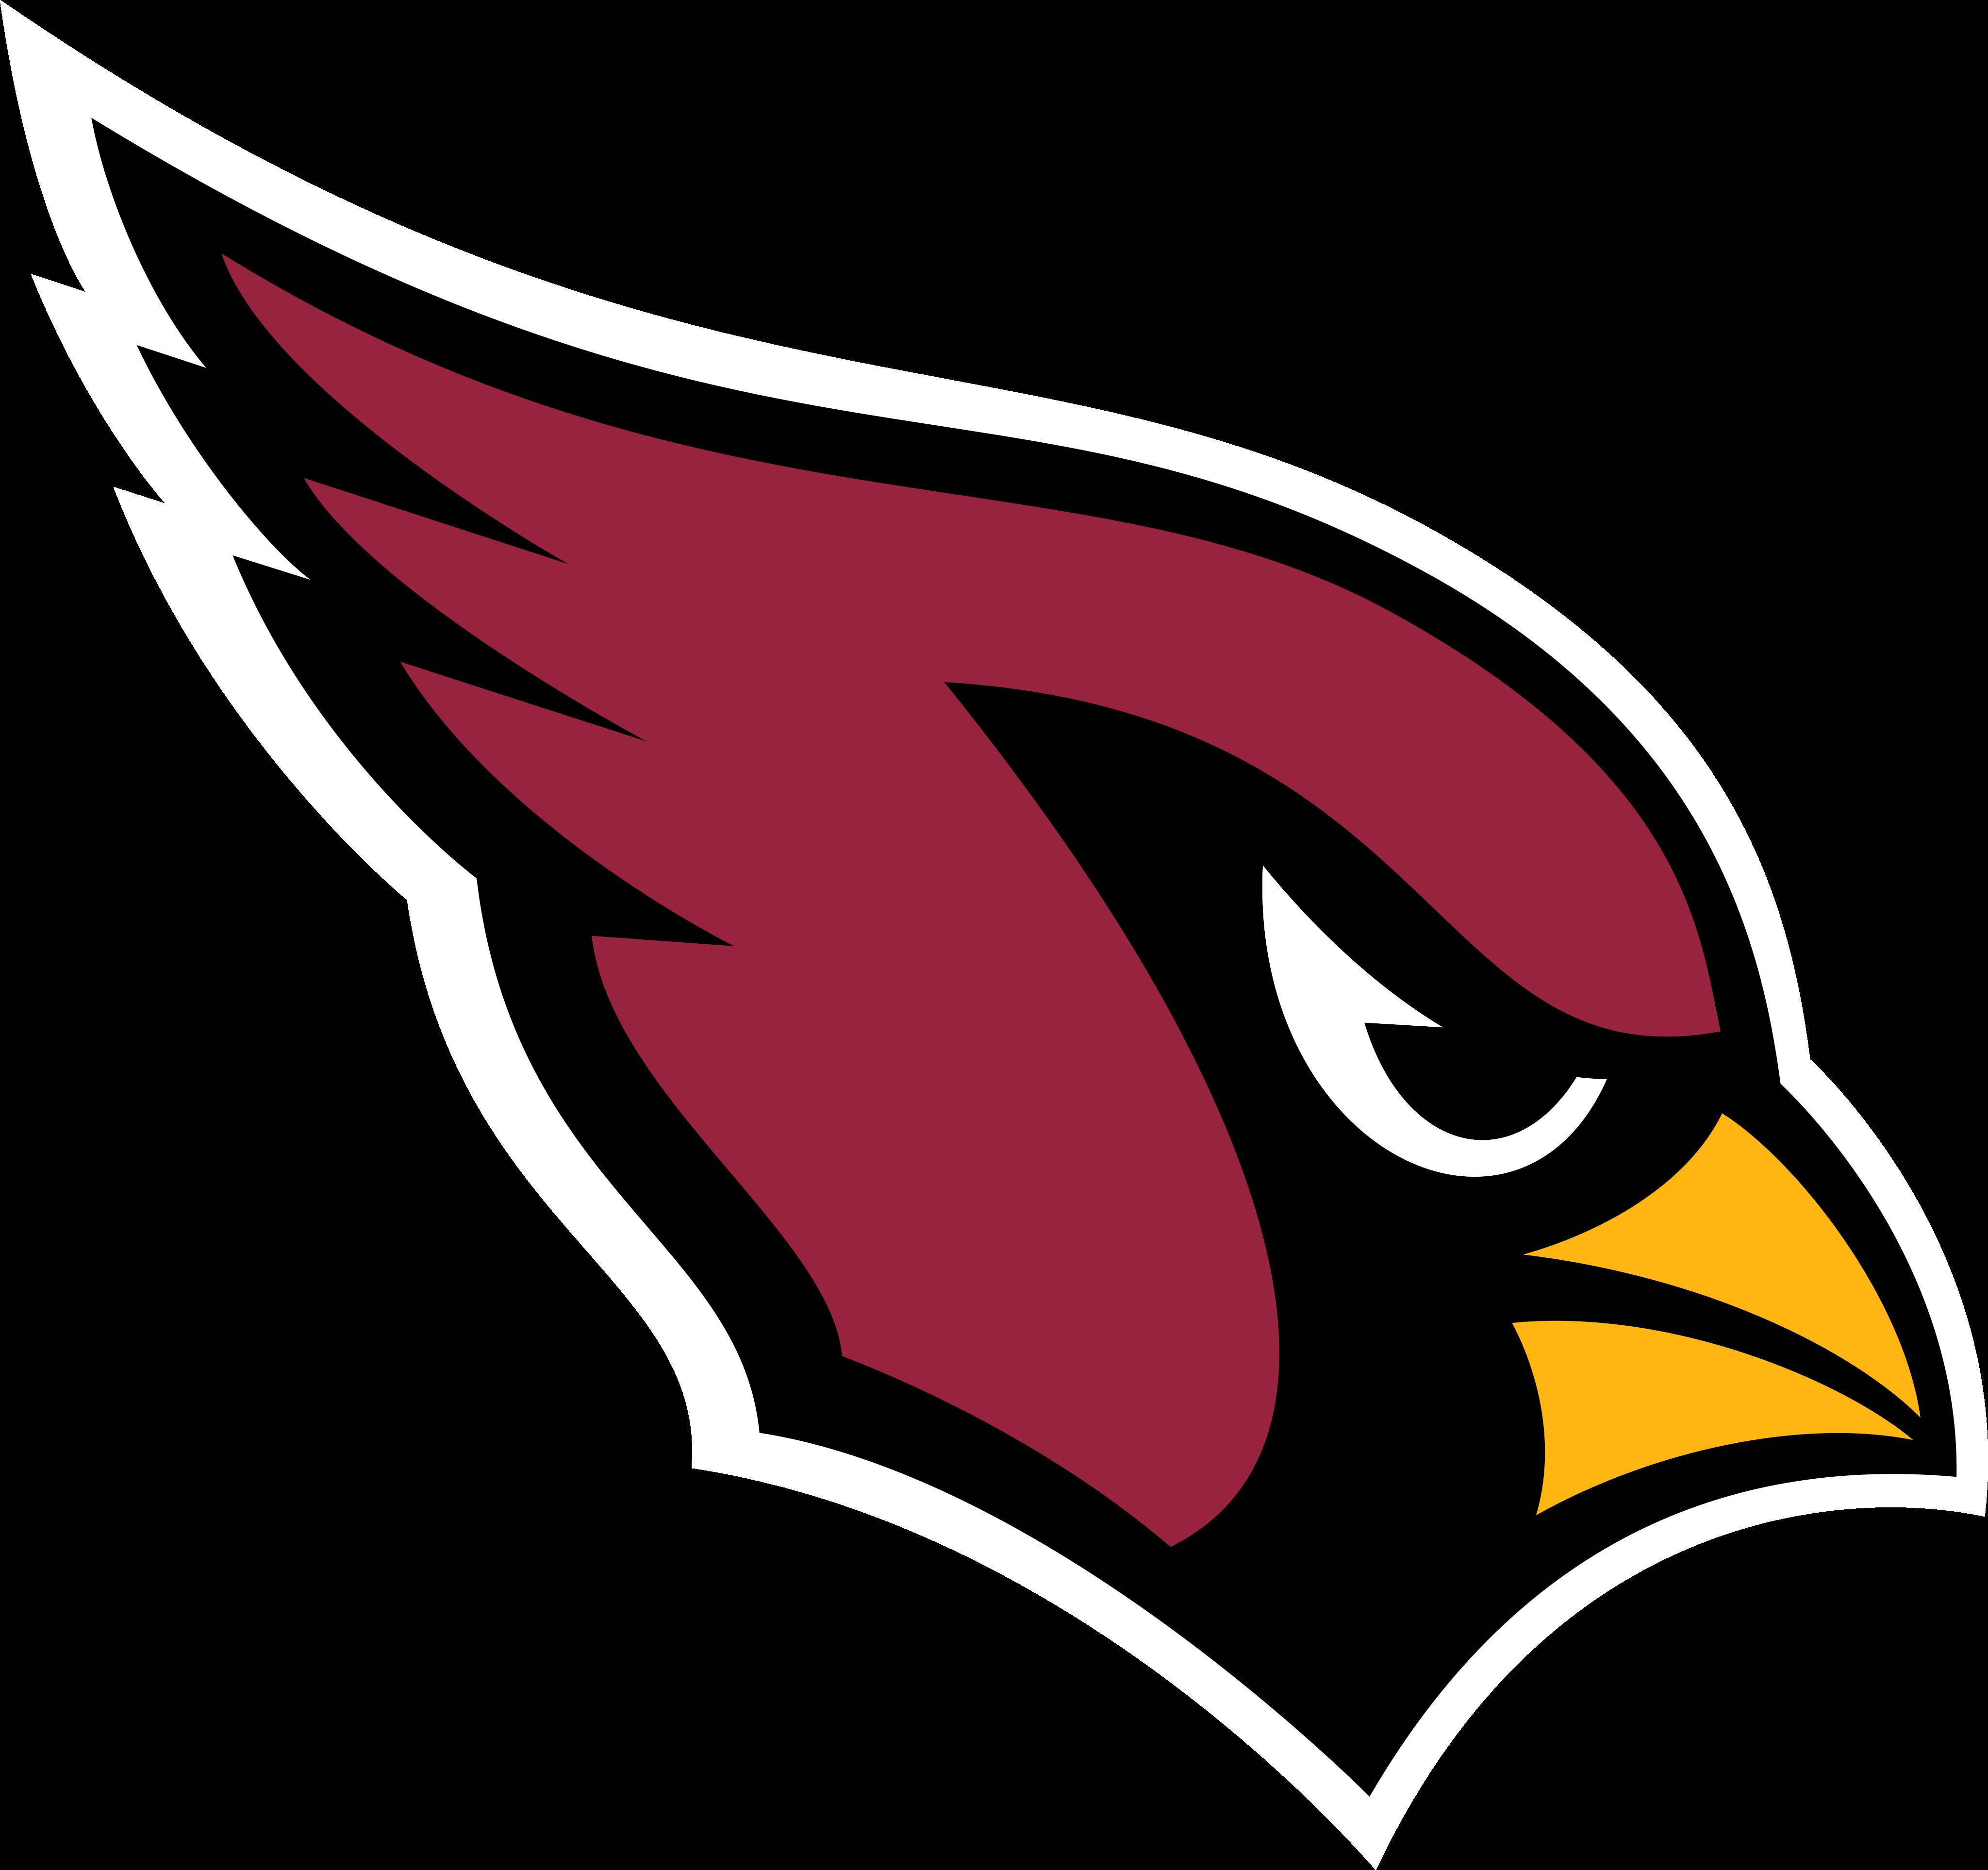 arizona cardinals logo 1 - Arizona Cardinals Logo